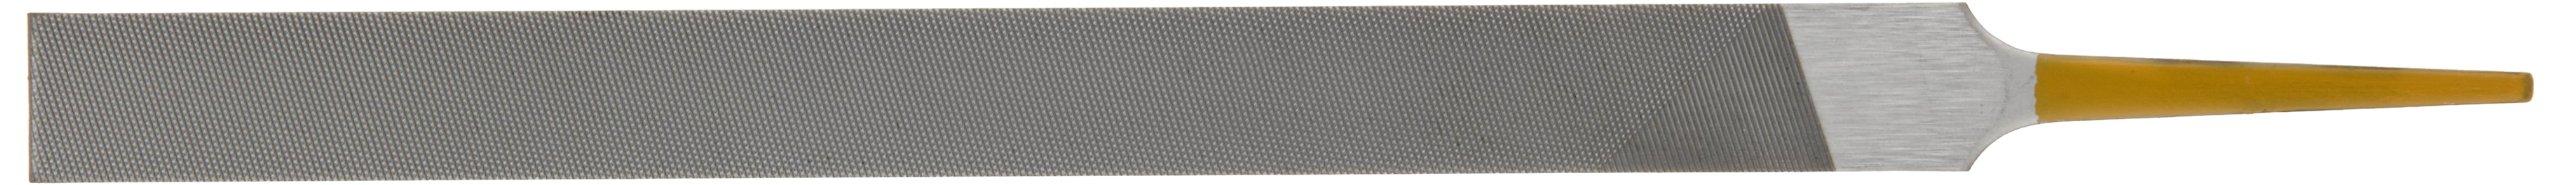 PFERD Machinist Hand File, Swiss Pattern, Double Cut, Rectangular, #00 Coarseness, 6'' Length, 1/2'' Width, 5/32'' Thickness